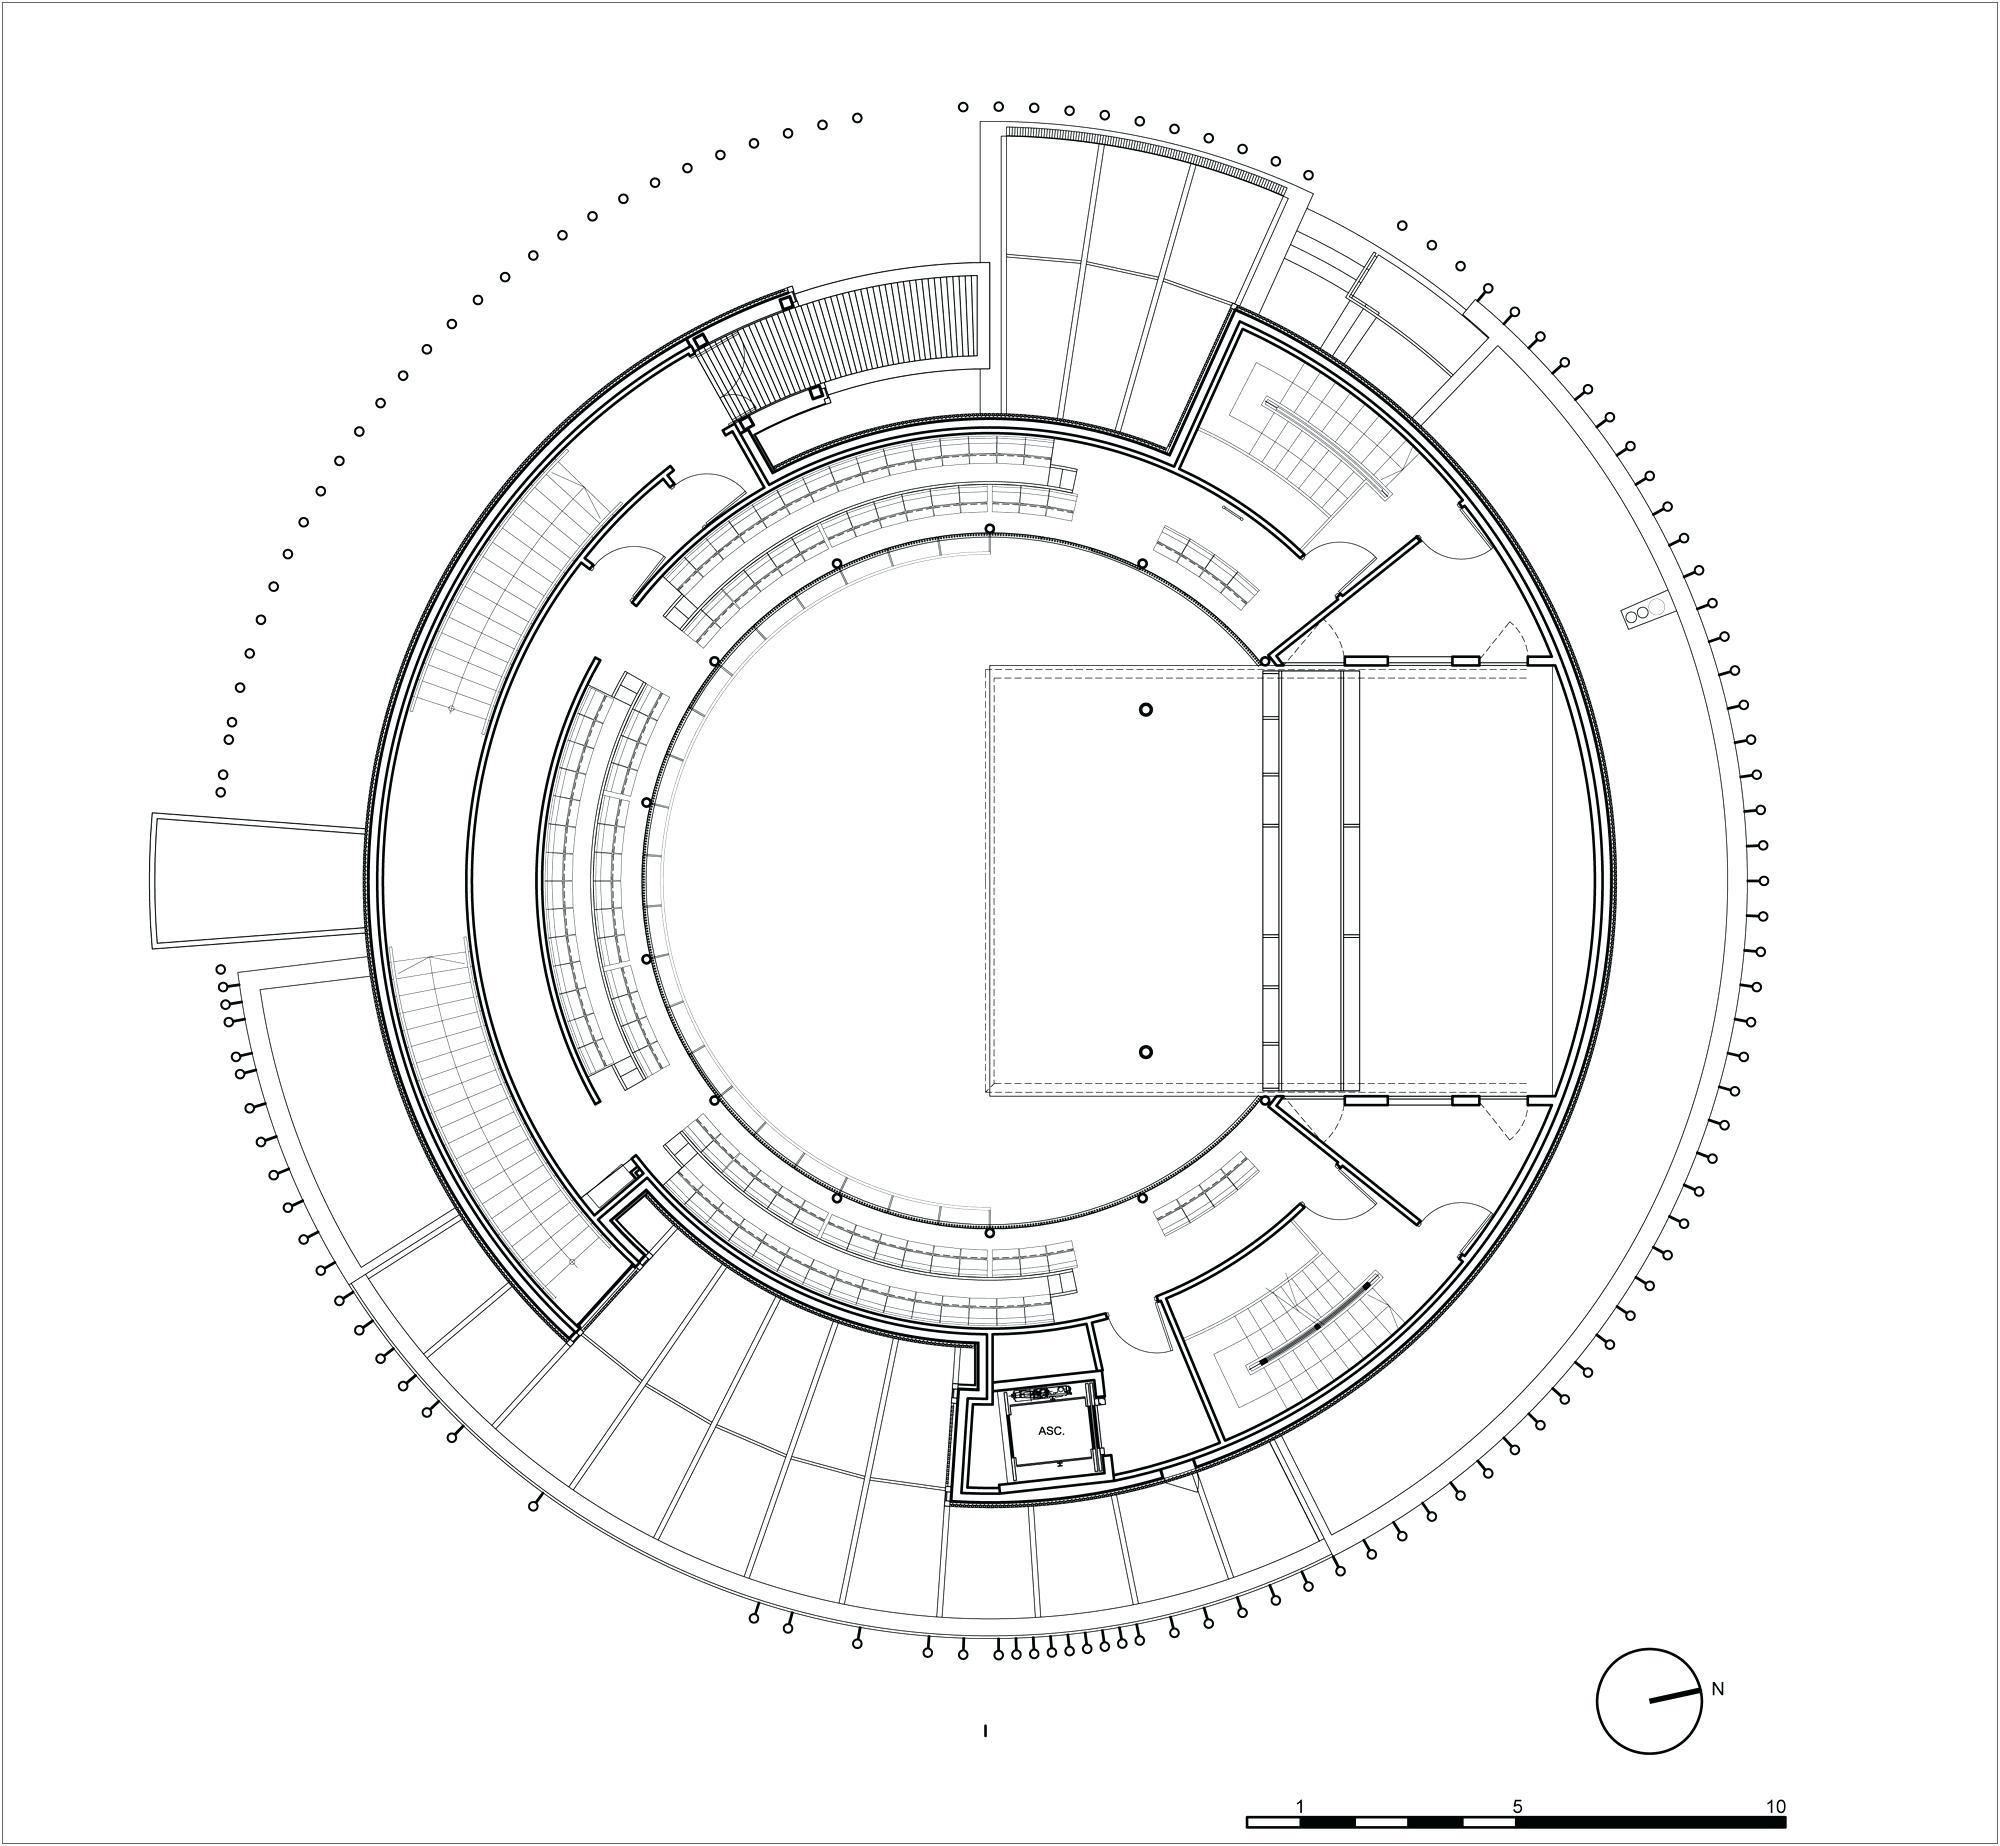 globe theater diagram mitsubishi pajero wiring for radio drawing at getdrawings com free personal use 2000x1846 shakespeare